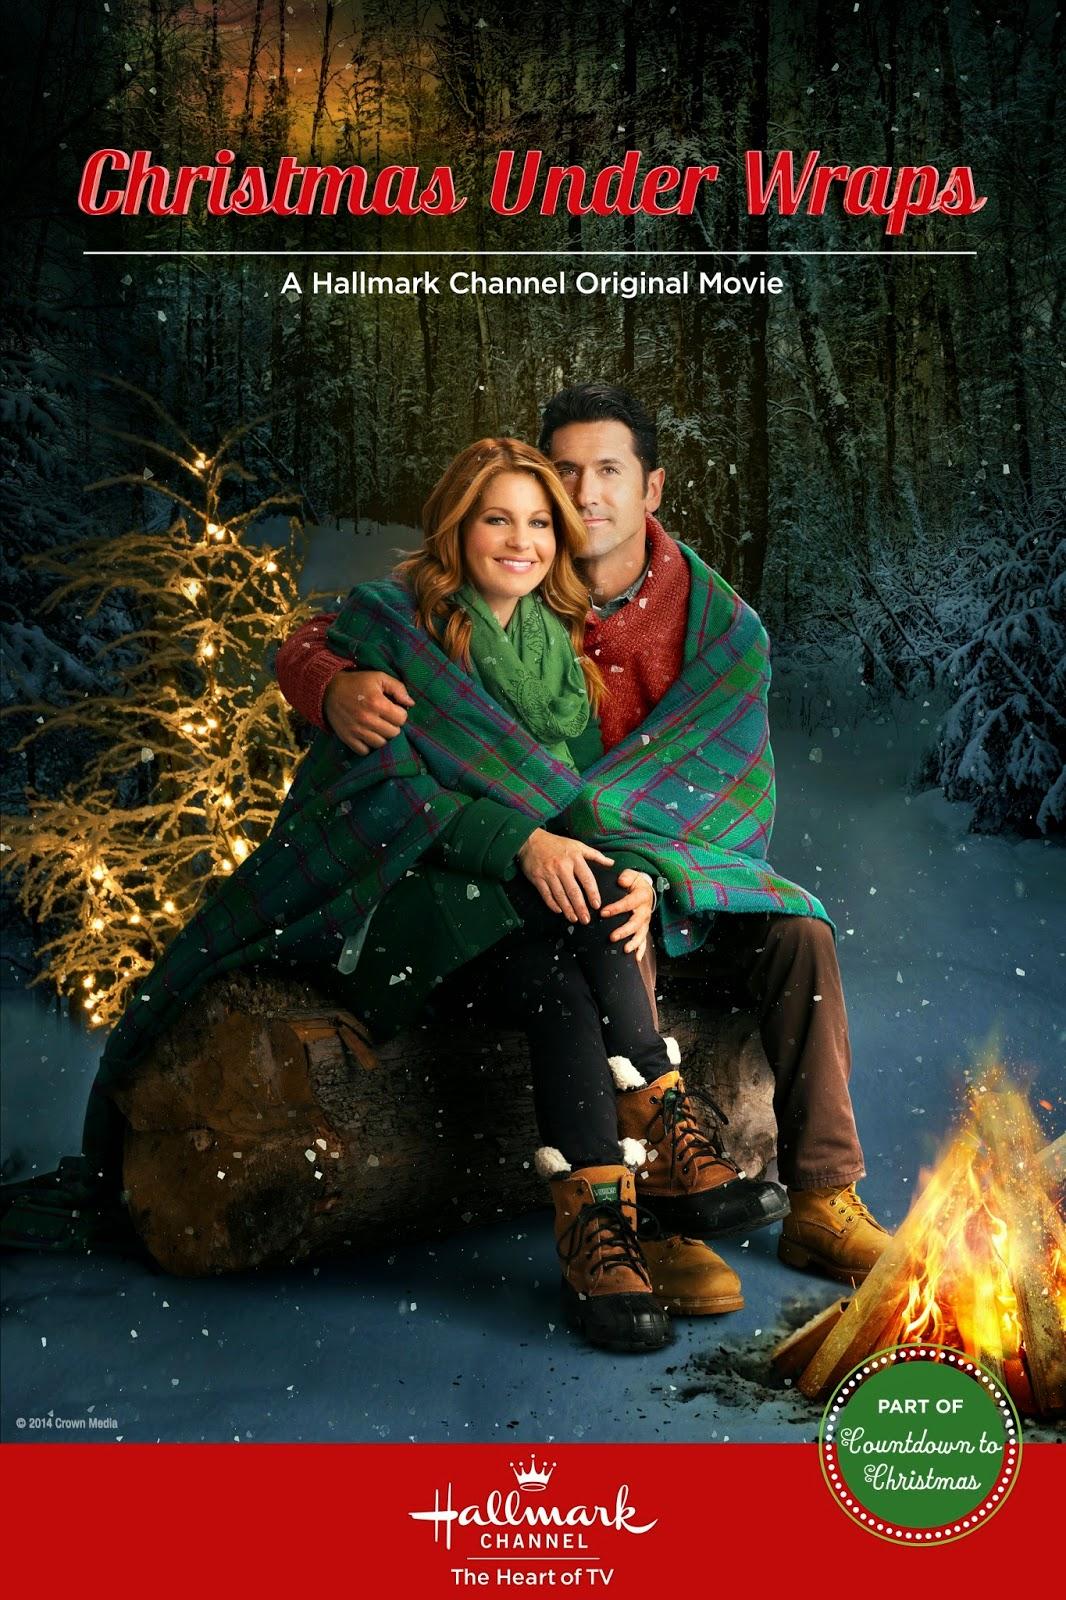 hallmark christmas movies in you tube